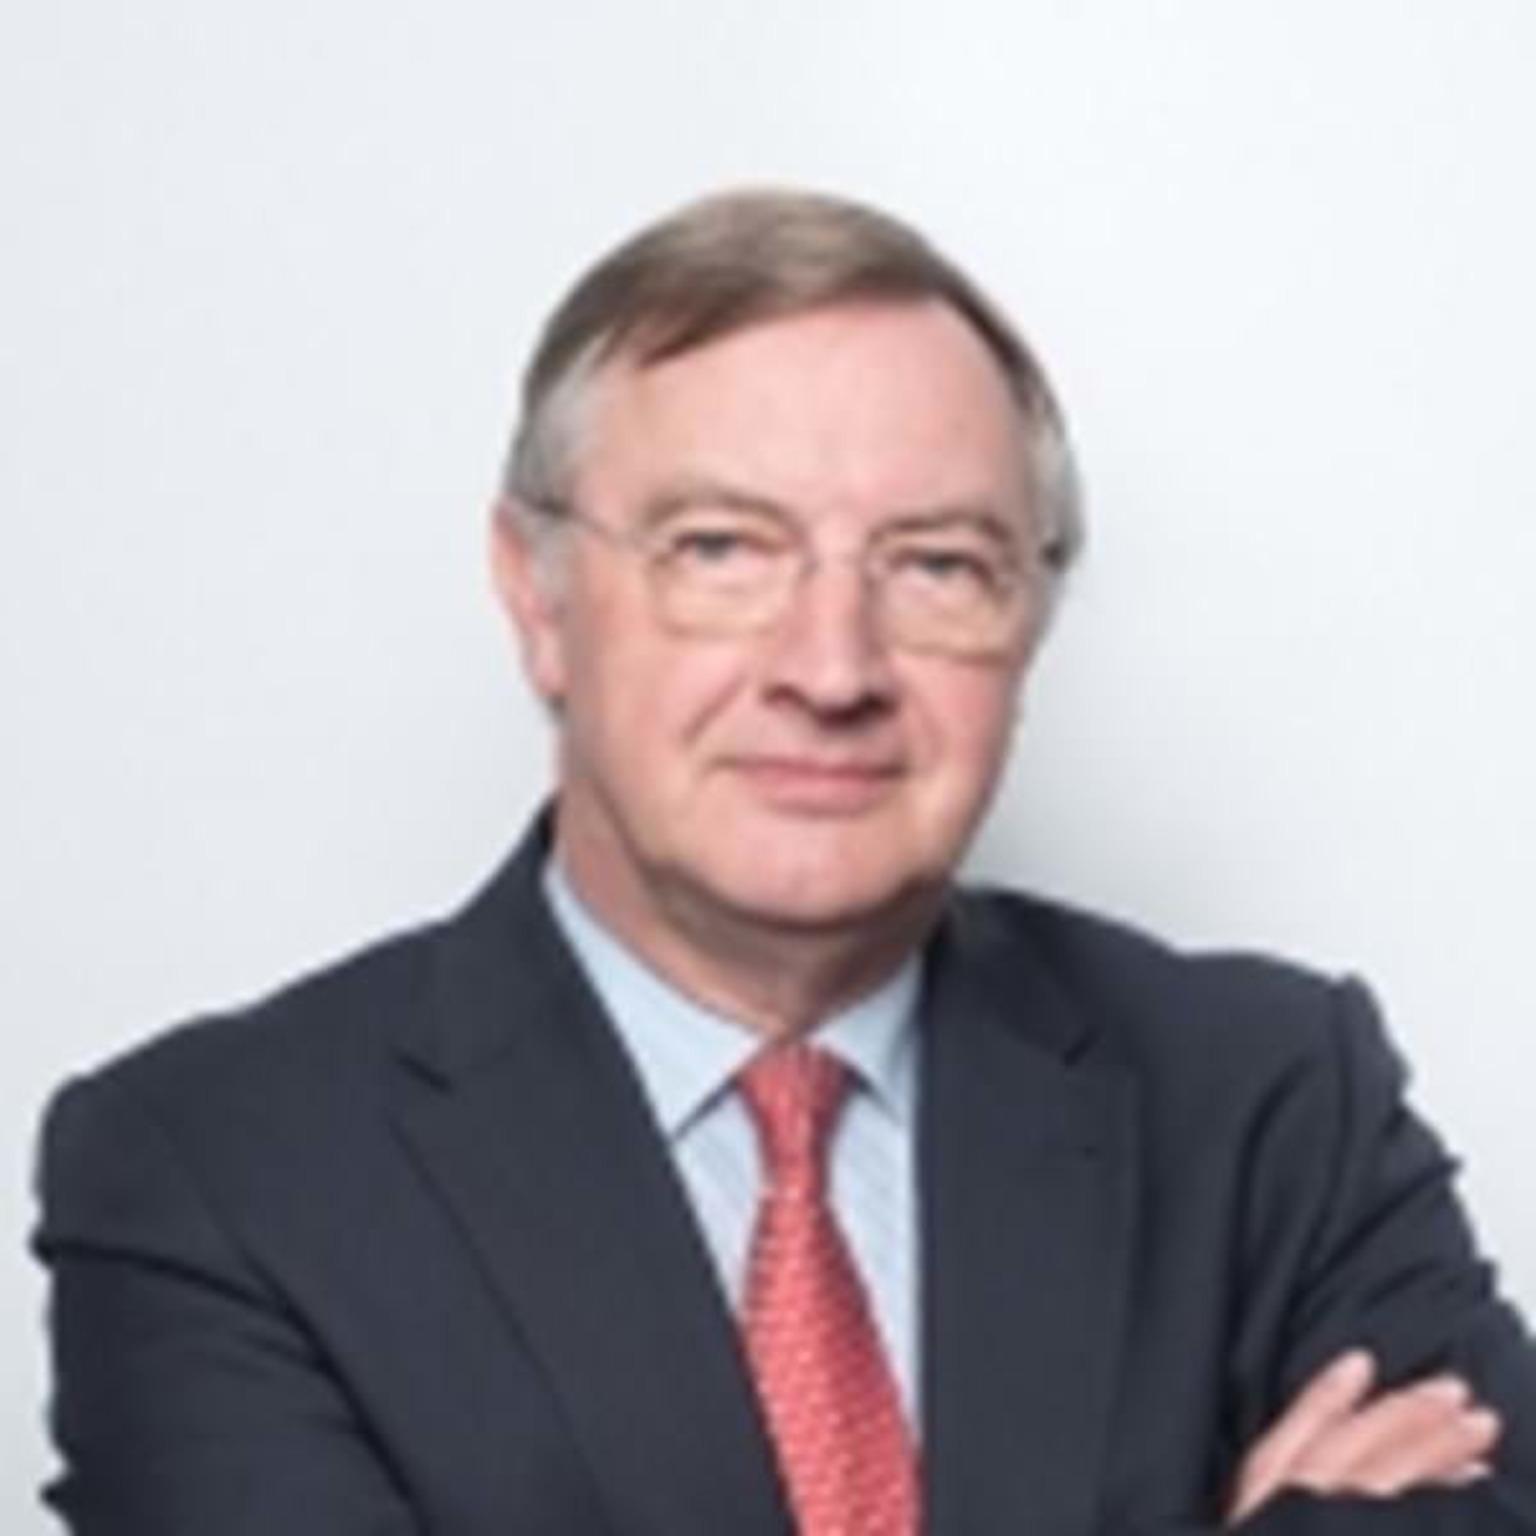 Jean Paul Renard